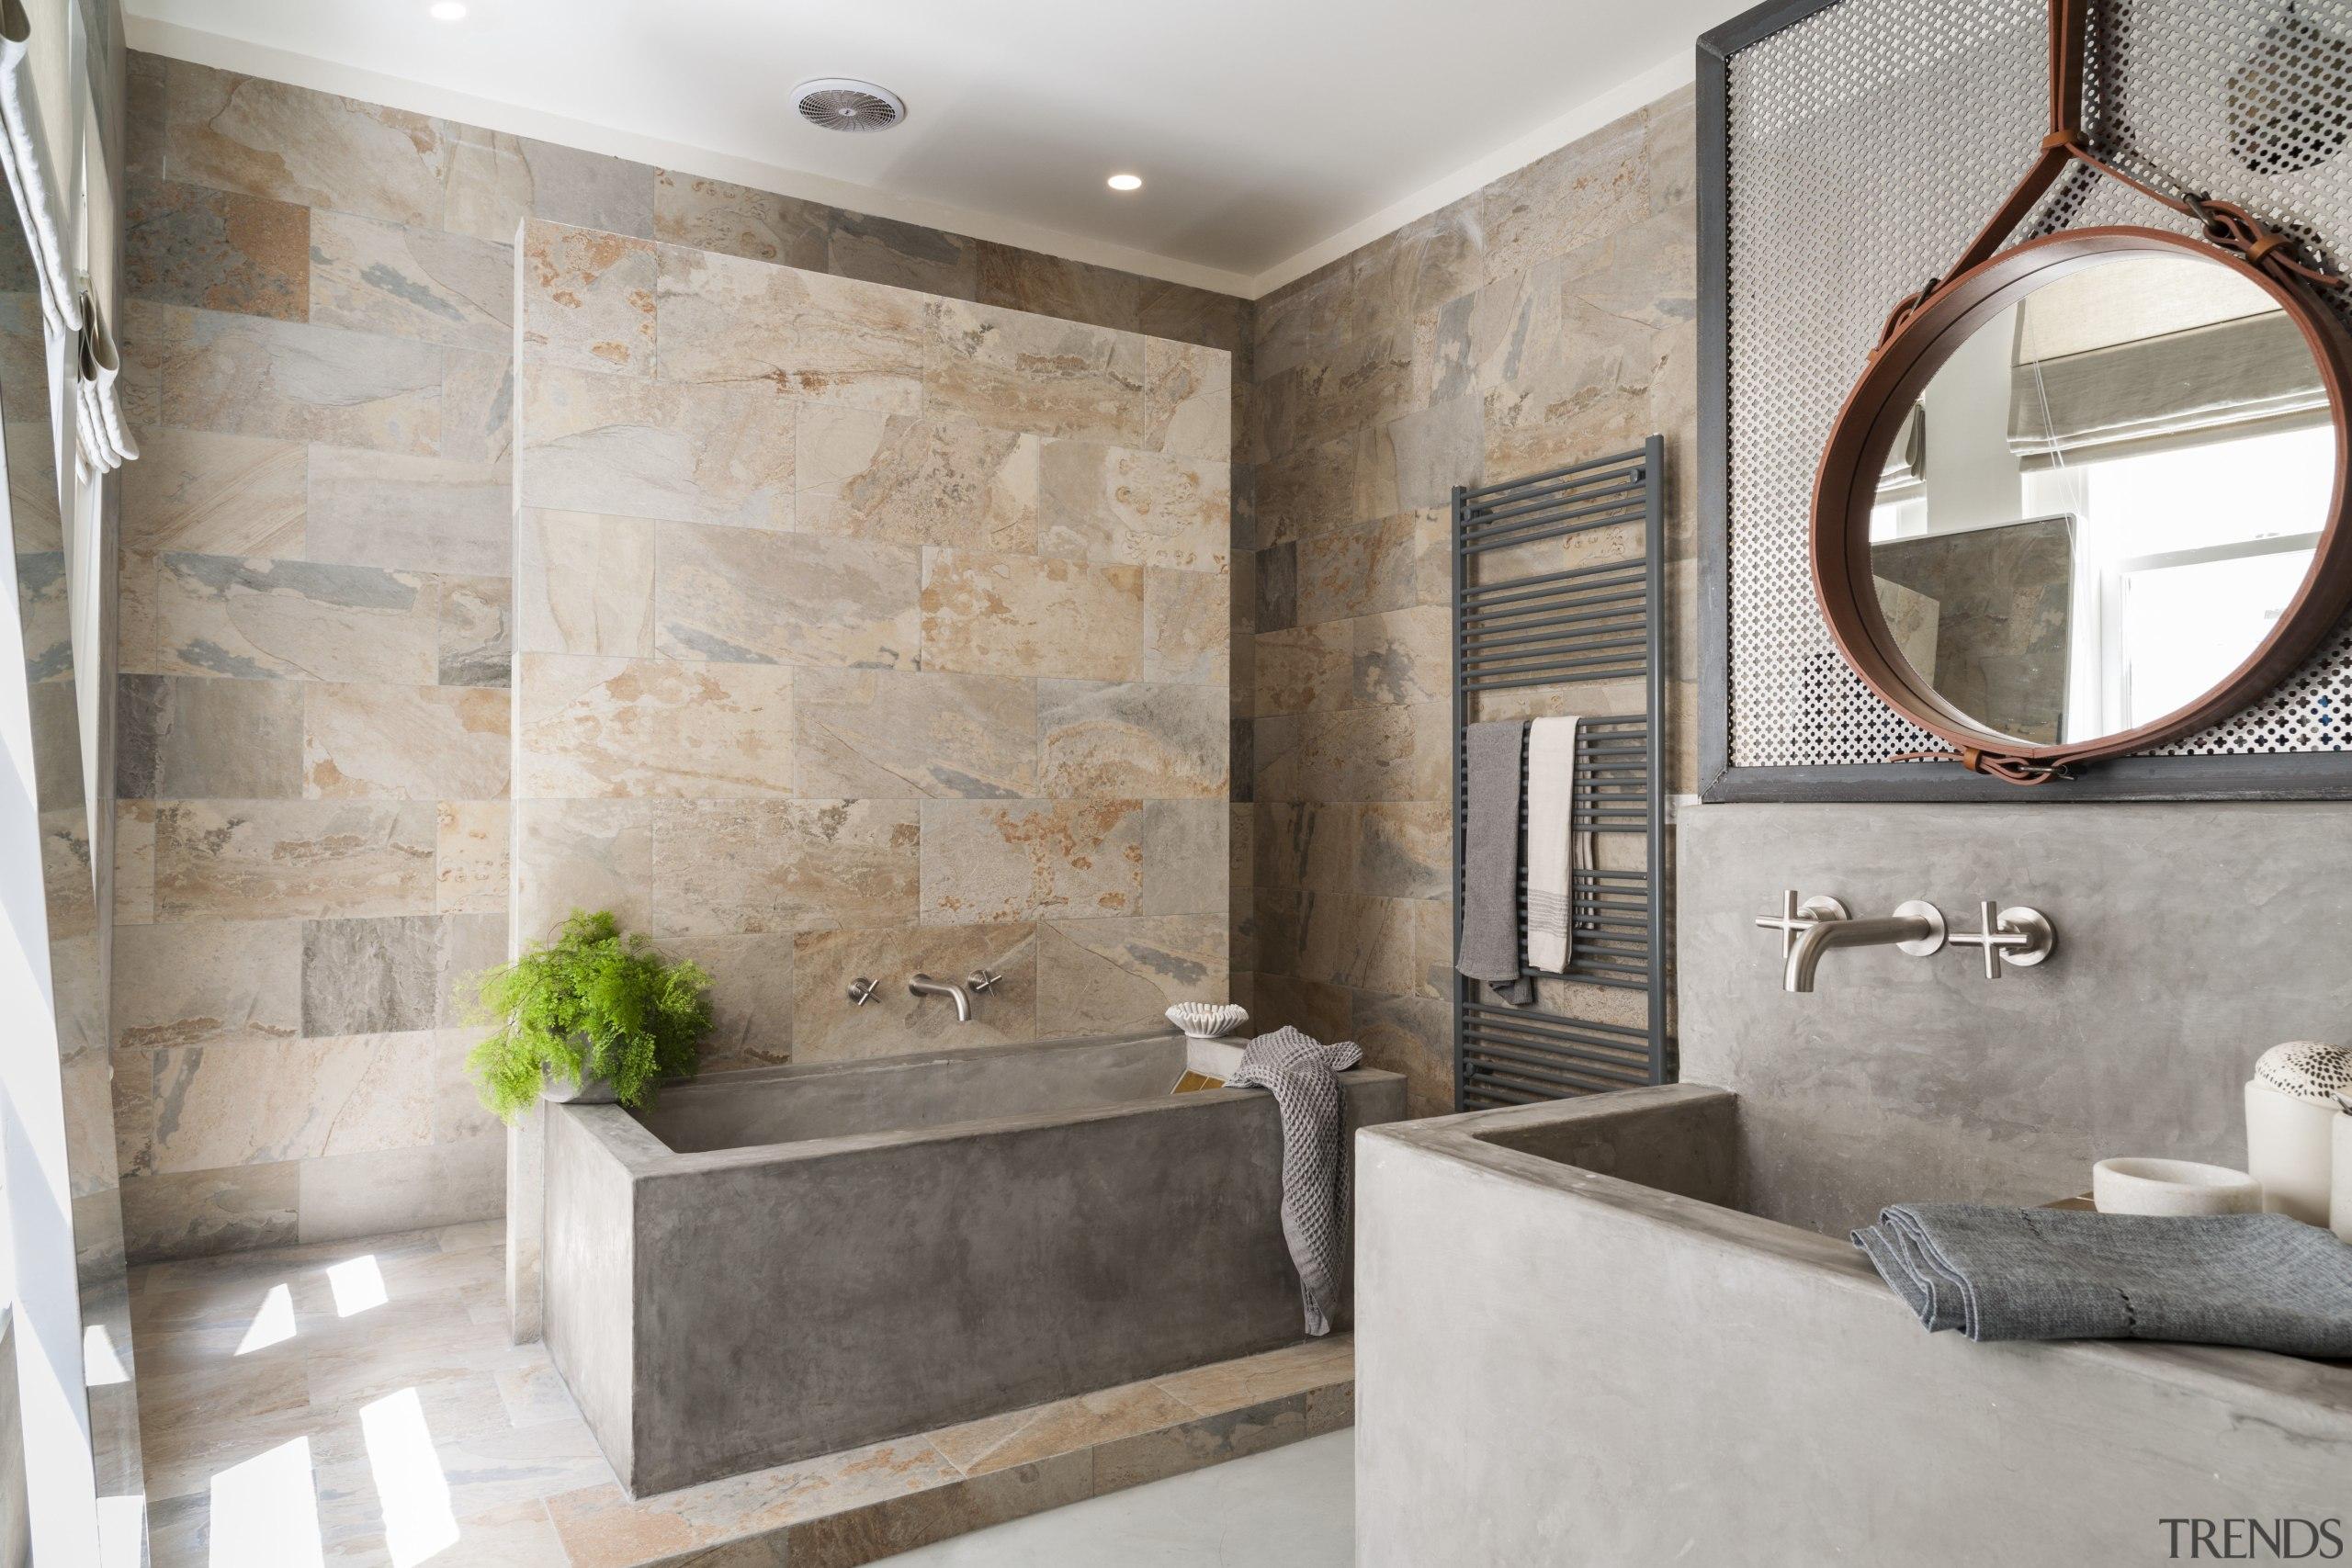 The natural tones of the Verde slate stone bathroom, floor, flooring, home, interior design, real estate, room, tile, wall, gray